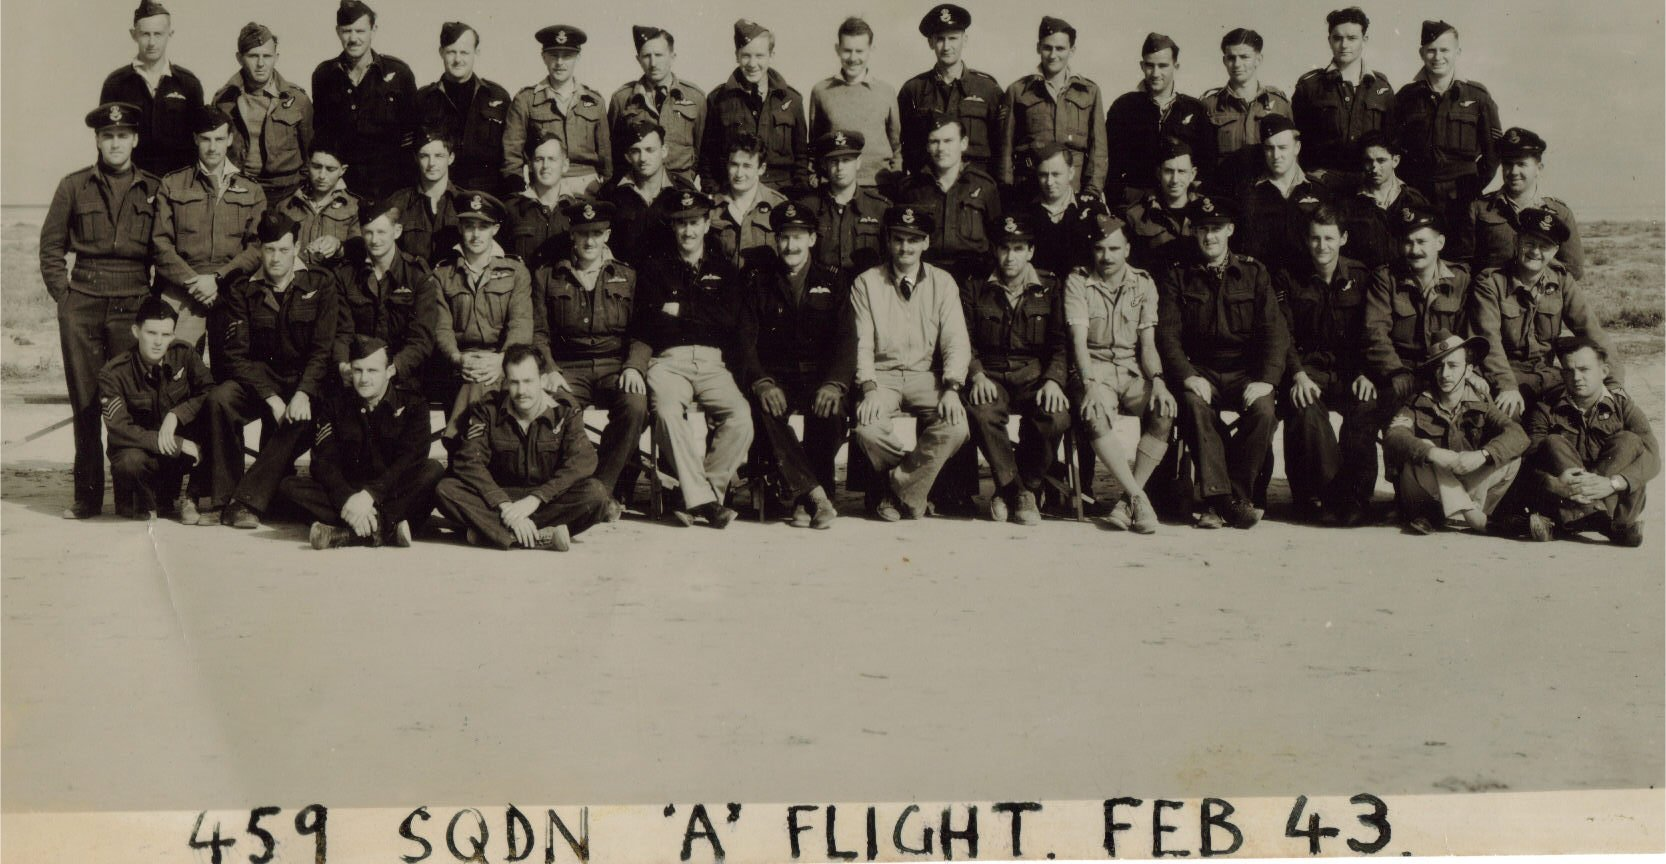 459 Squadron A Flight Feb 1943